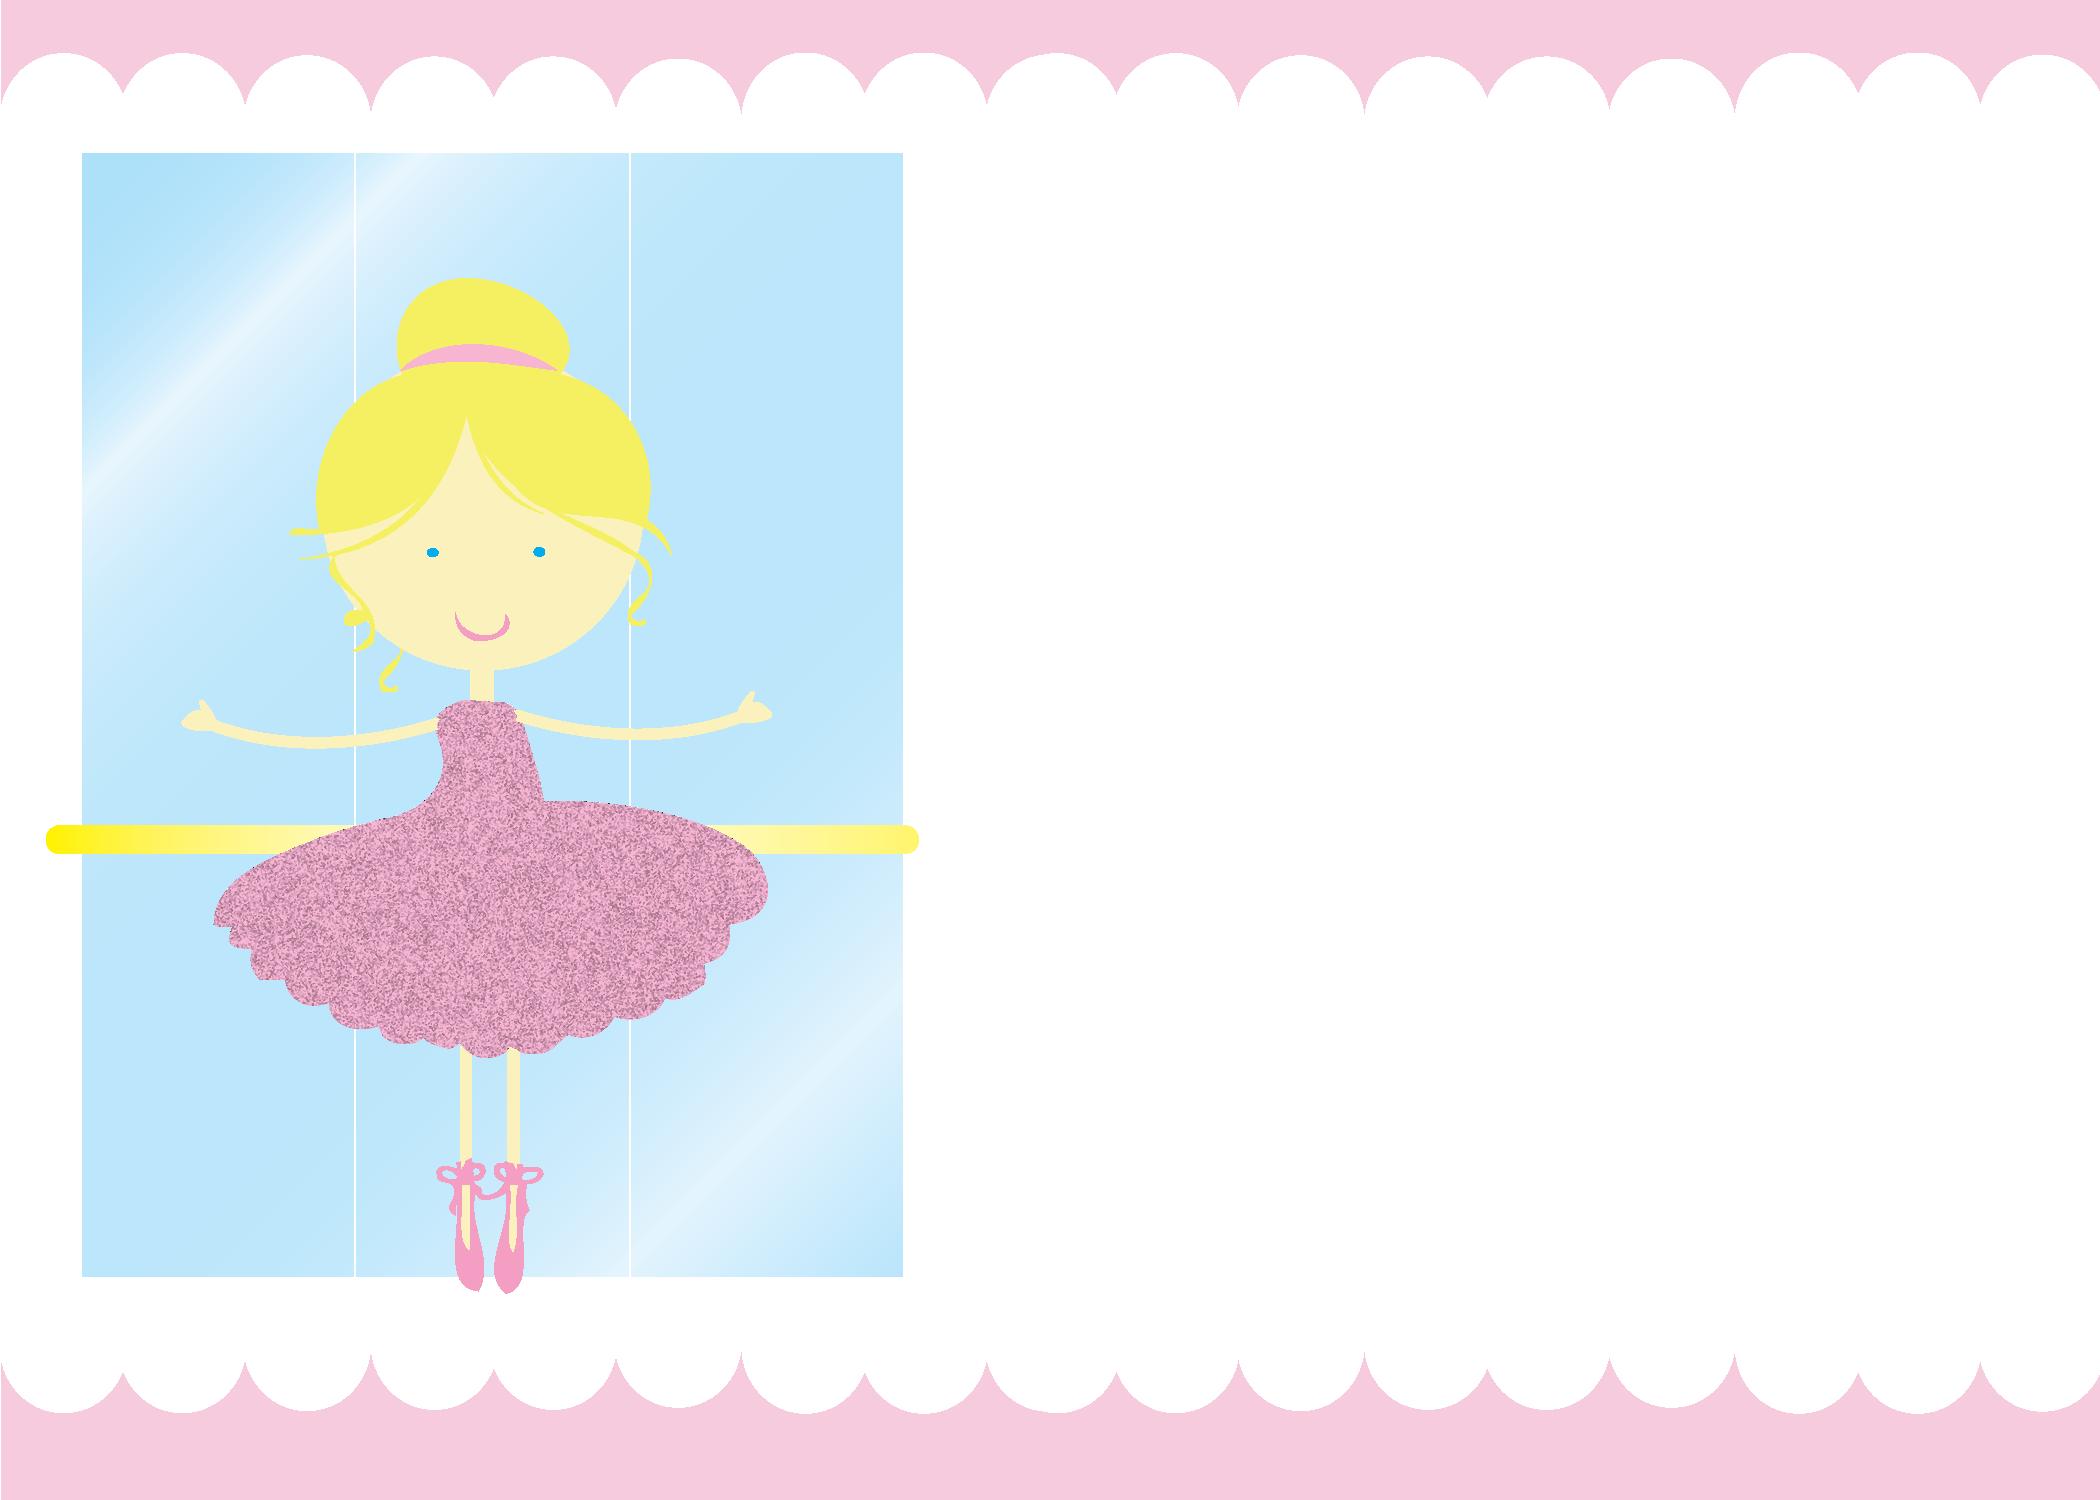 75 Adding Ballerina Birthday Invitation Template Free Formating for Ballerina Birthday Invitation Template Free